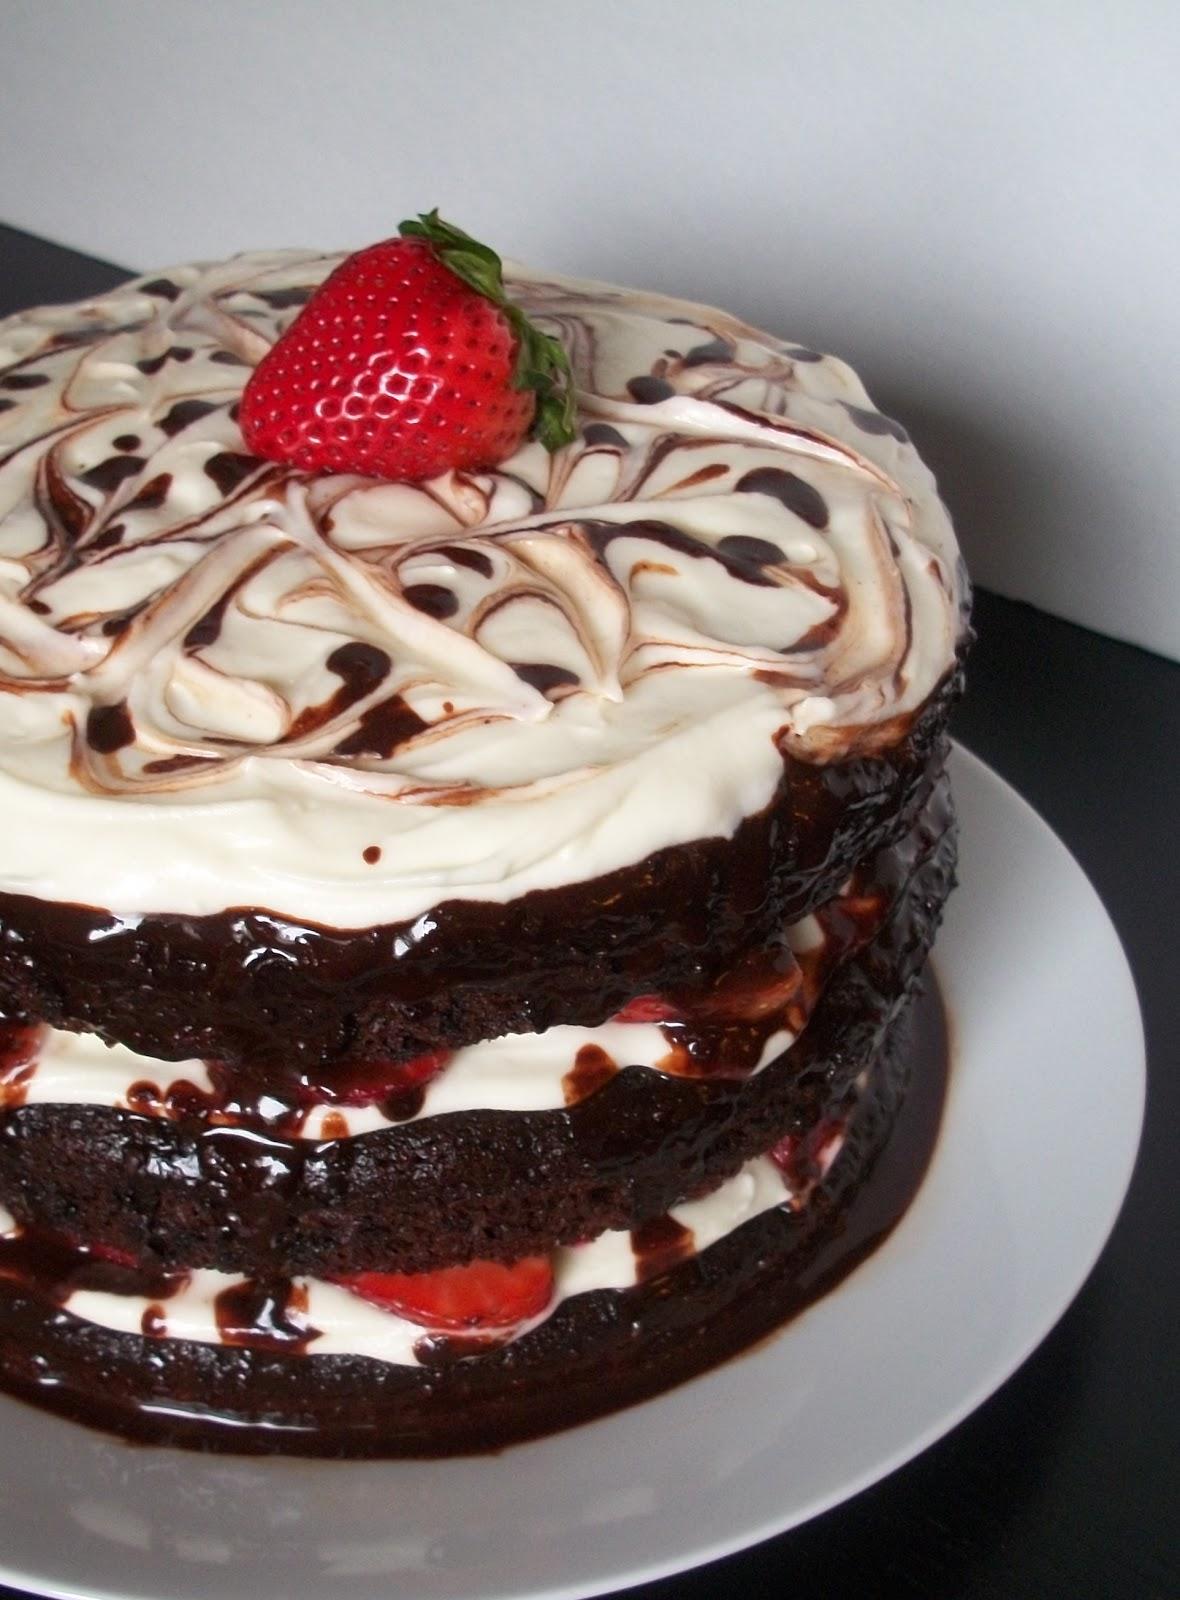 Moms Birthday Cake And Homemade Chocolate Sauce